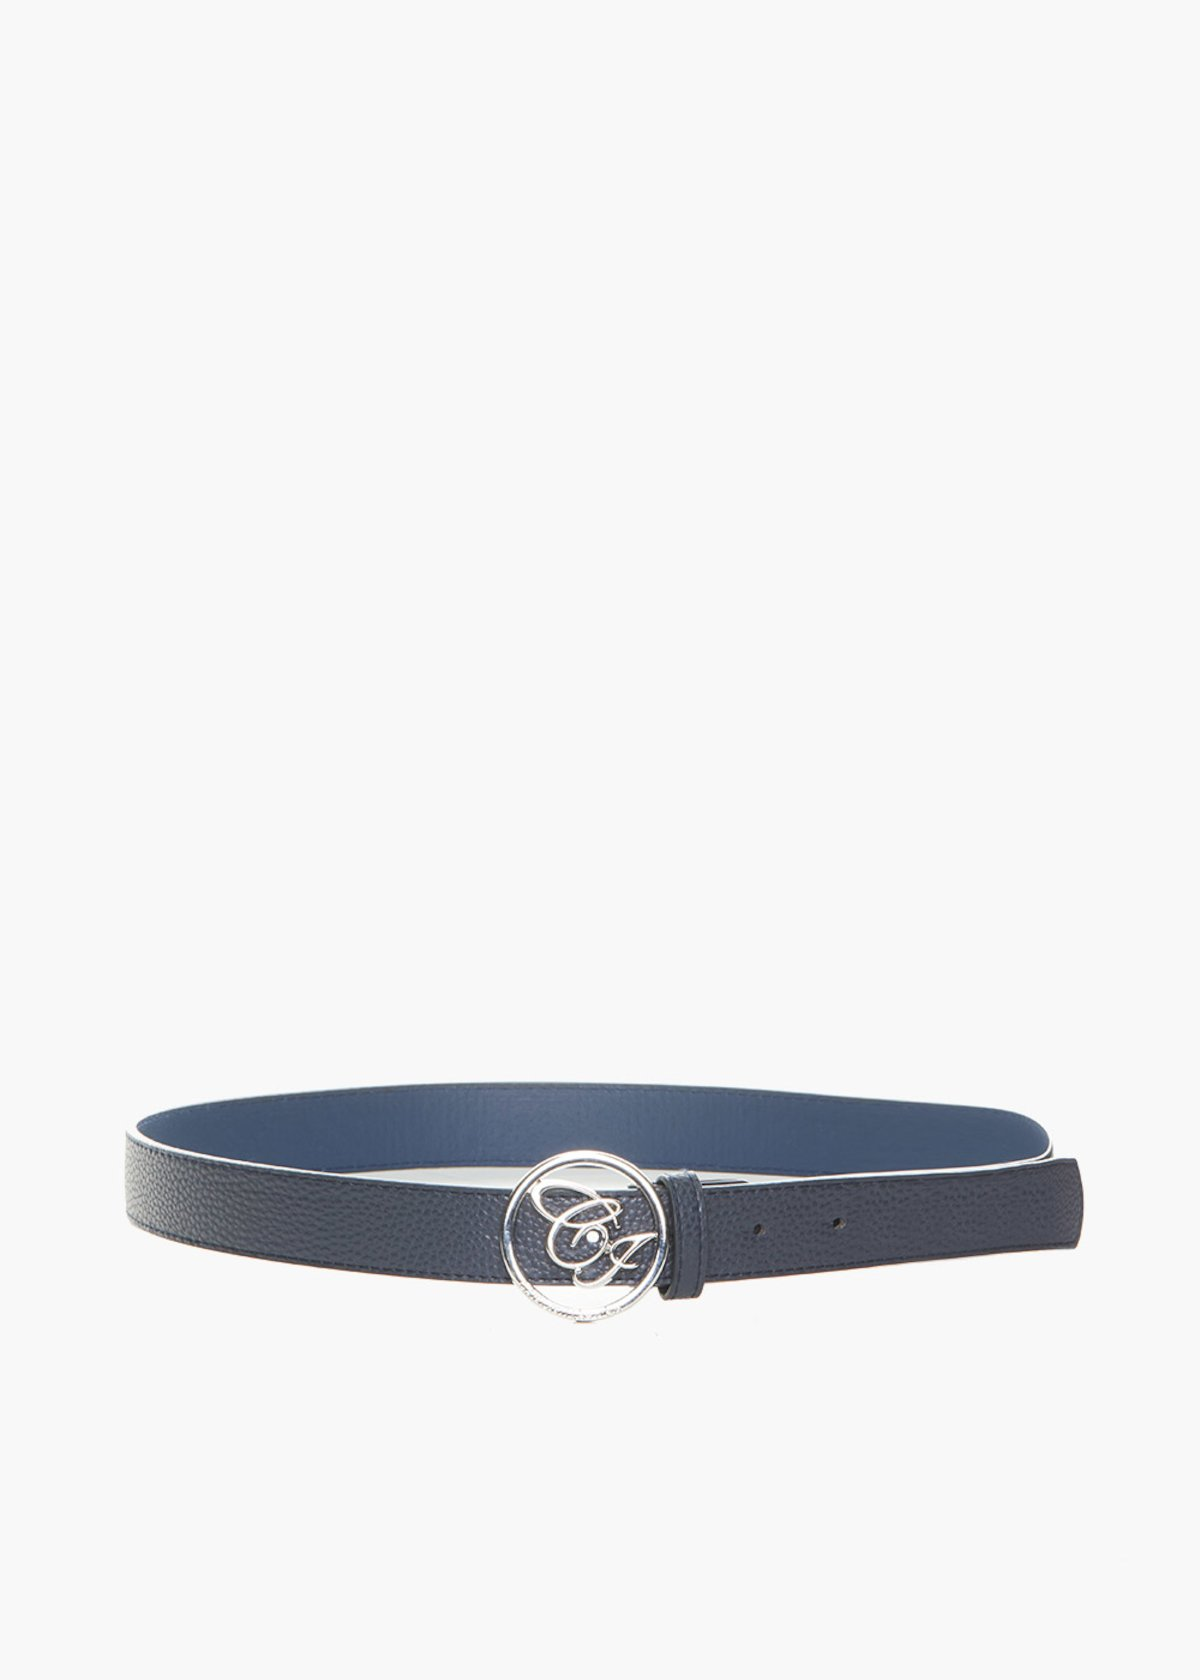 Faux leather Cinty belt deer print and metal logo fastening